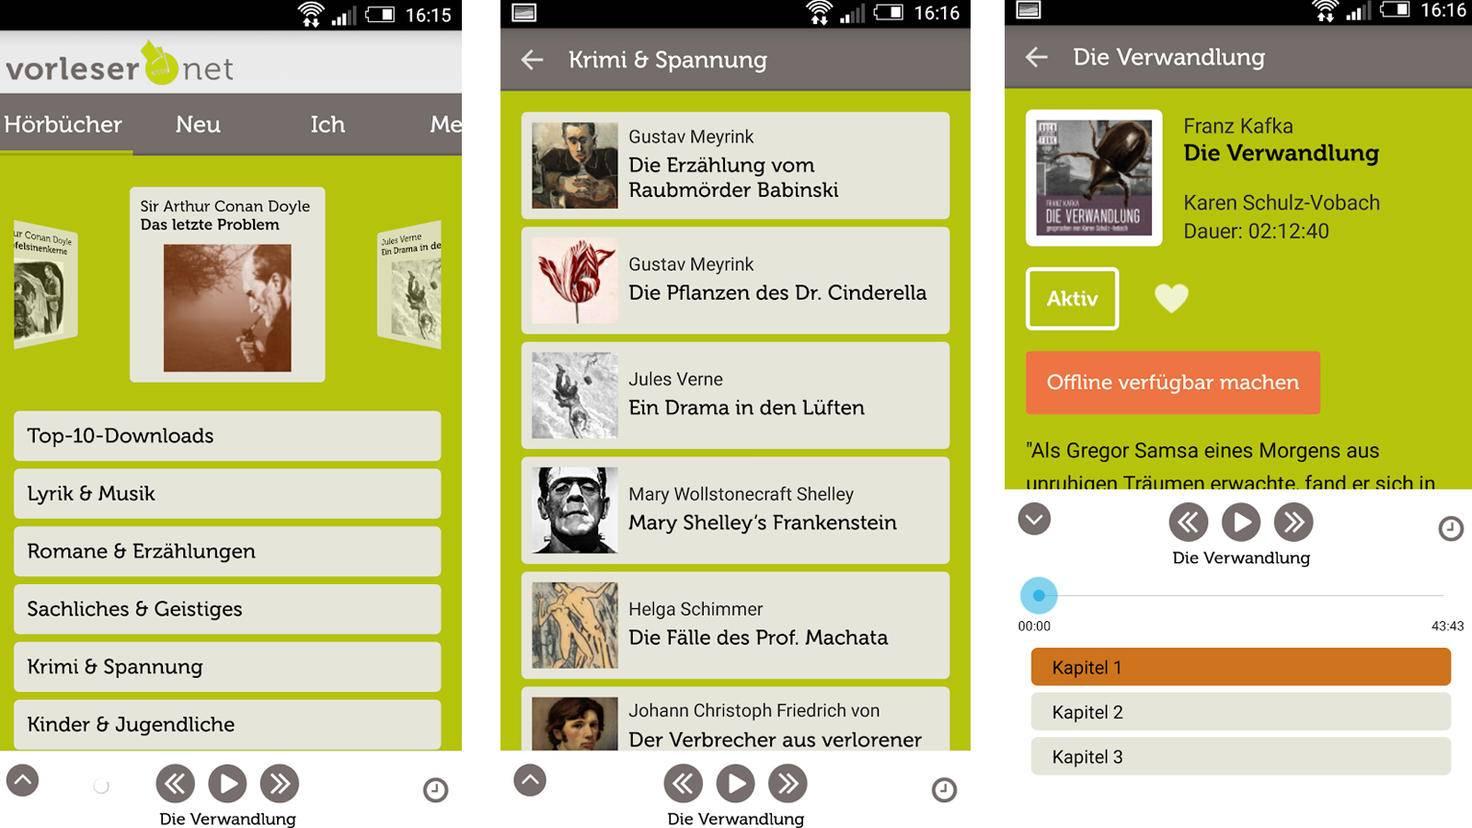 Vorleser-Google PlayStore-publishAir UG